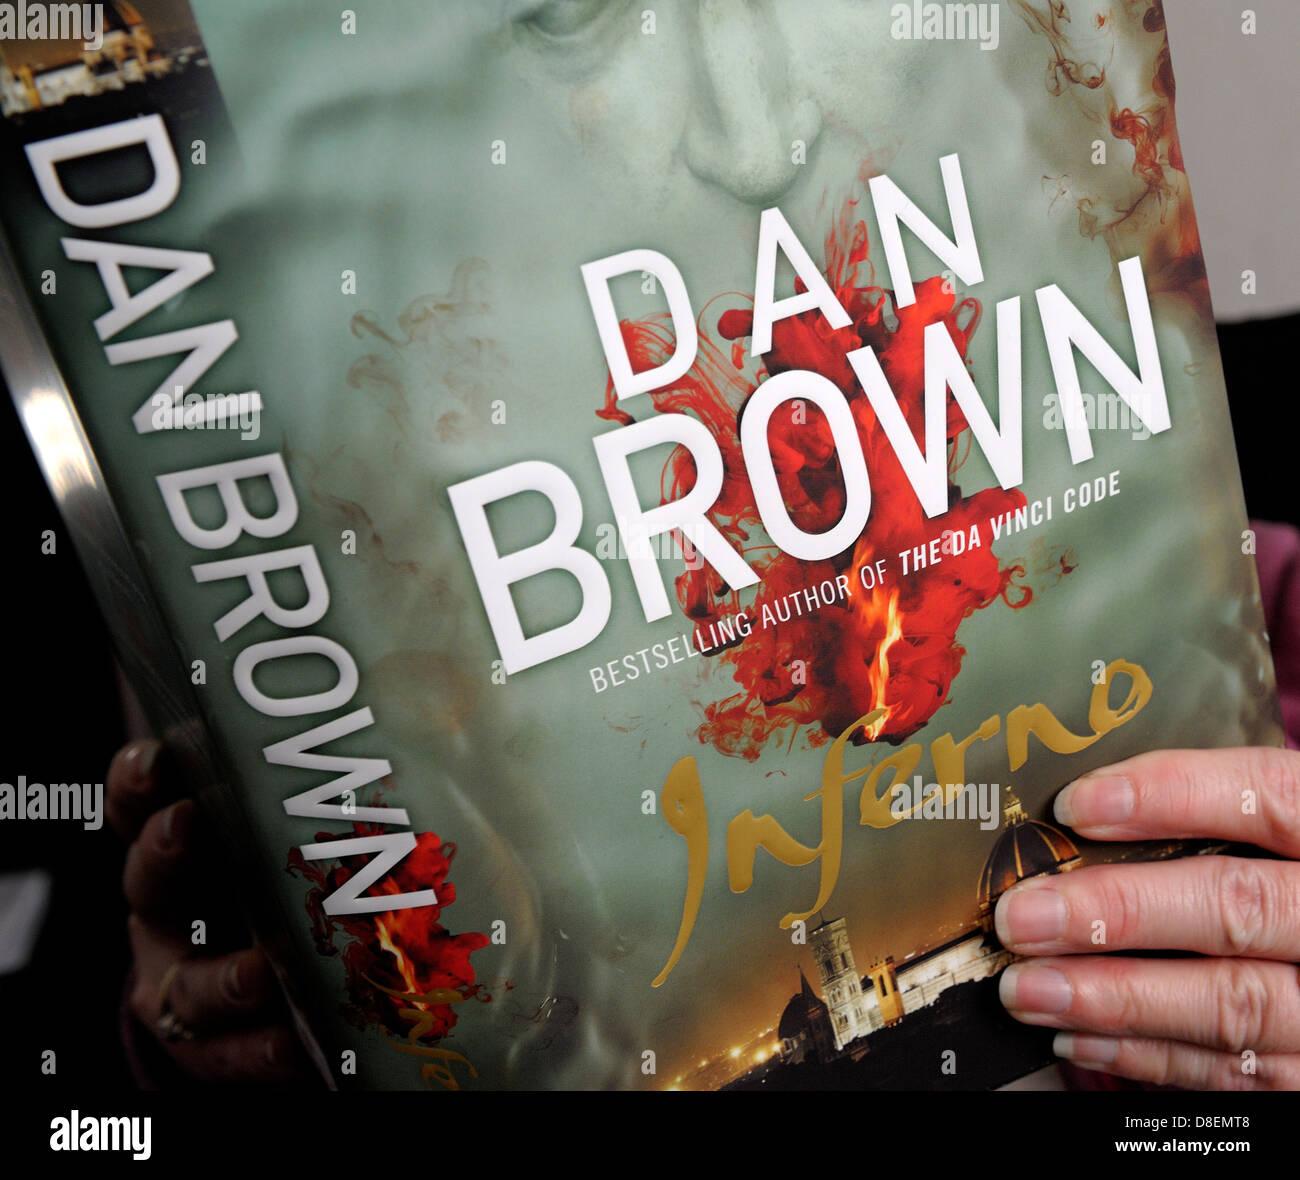 Dan Brown book cover Inferno - Stock Image